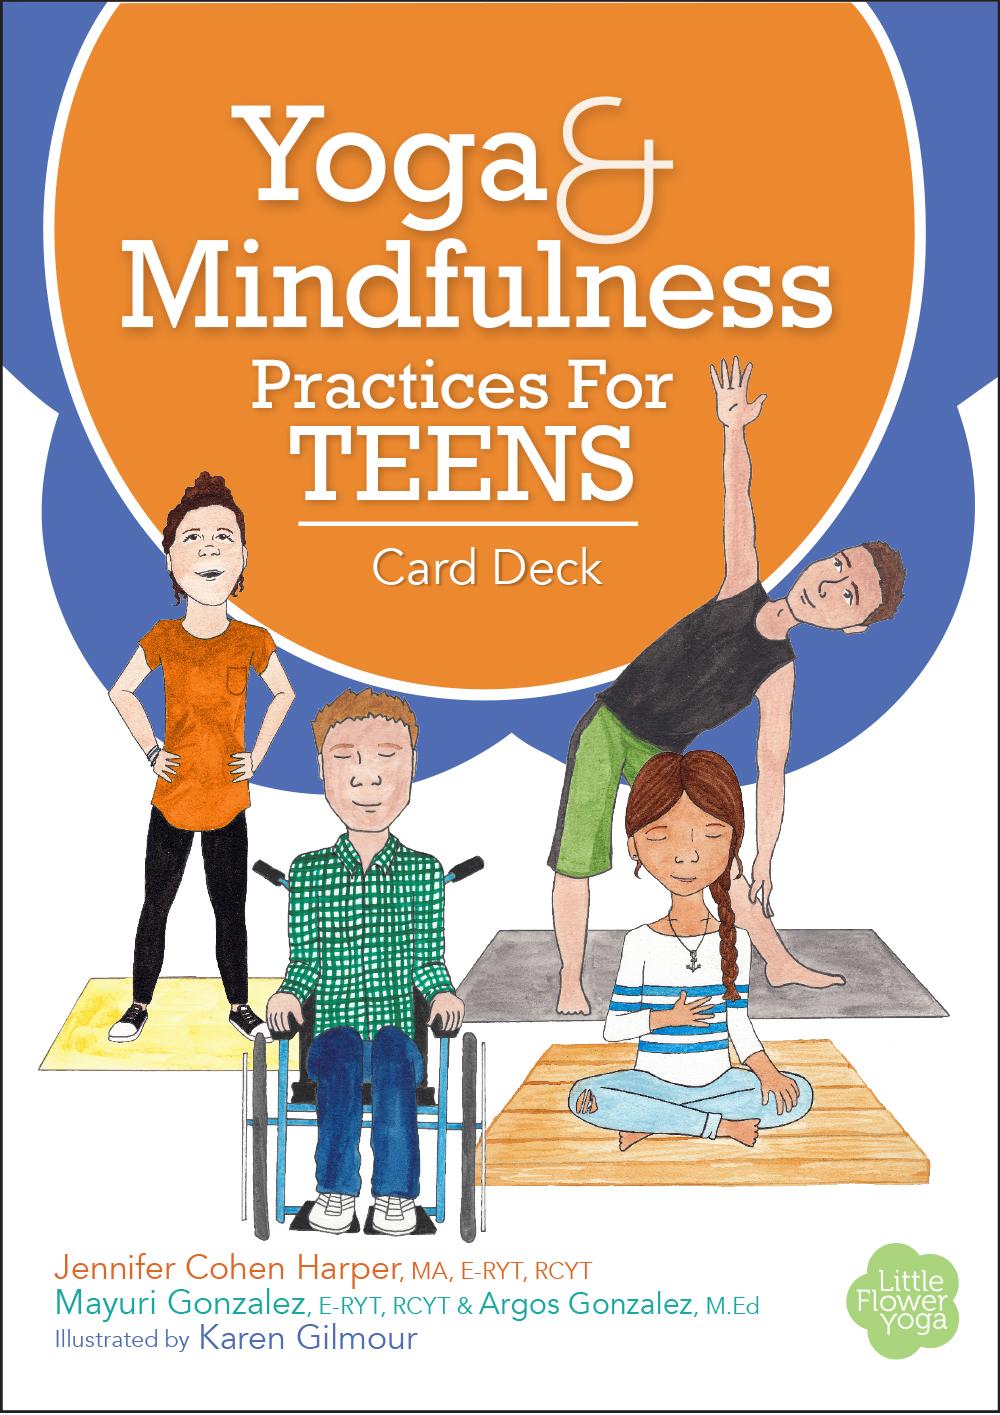 Grow Yoga Nj : Mindfulness, Teens